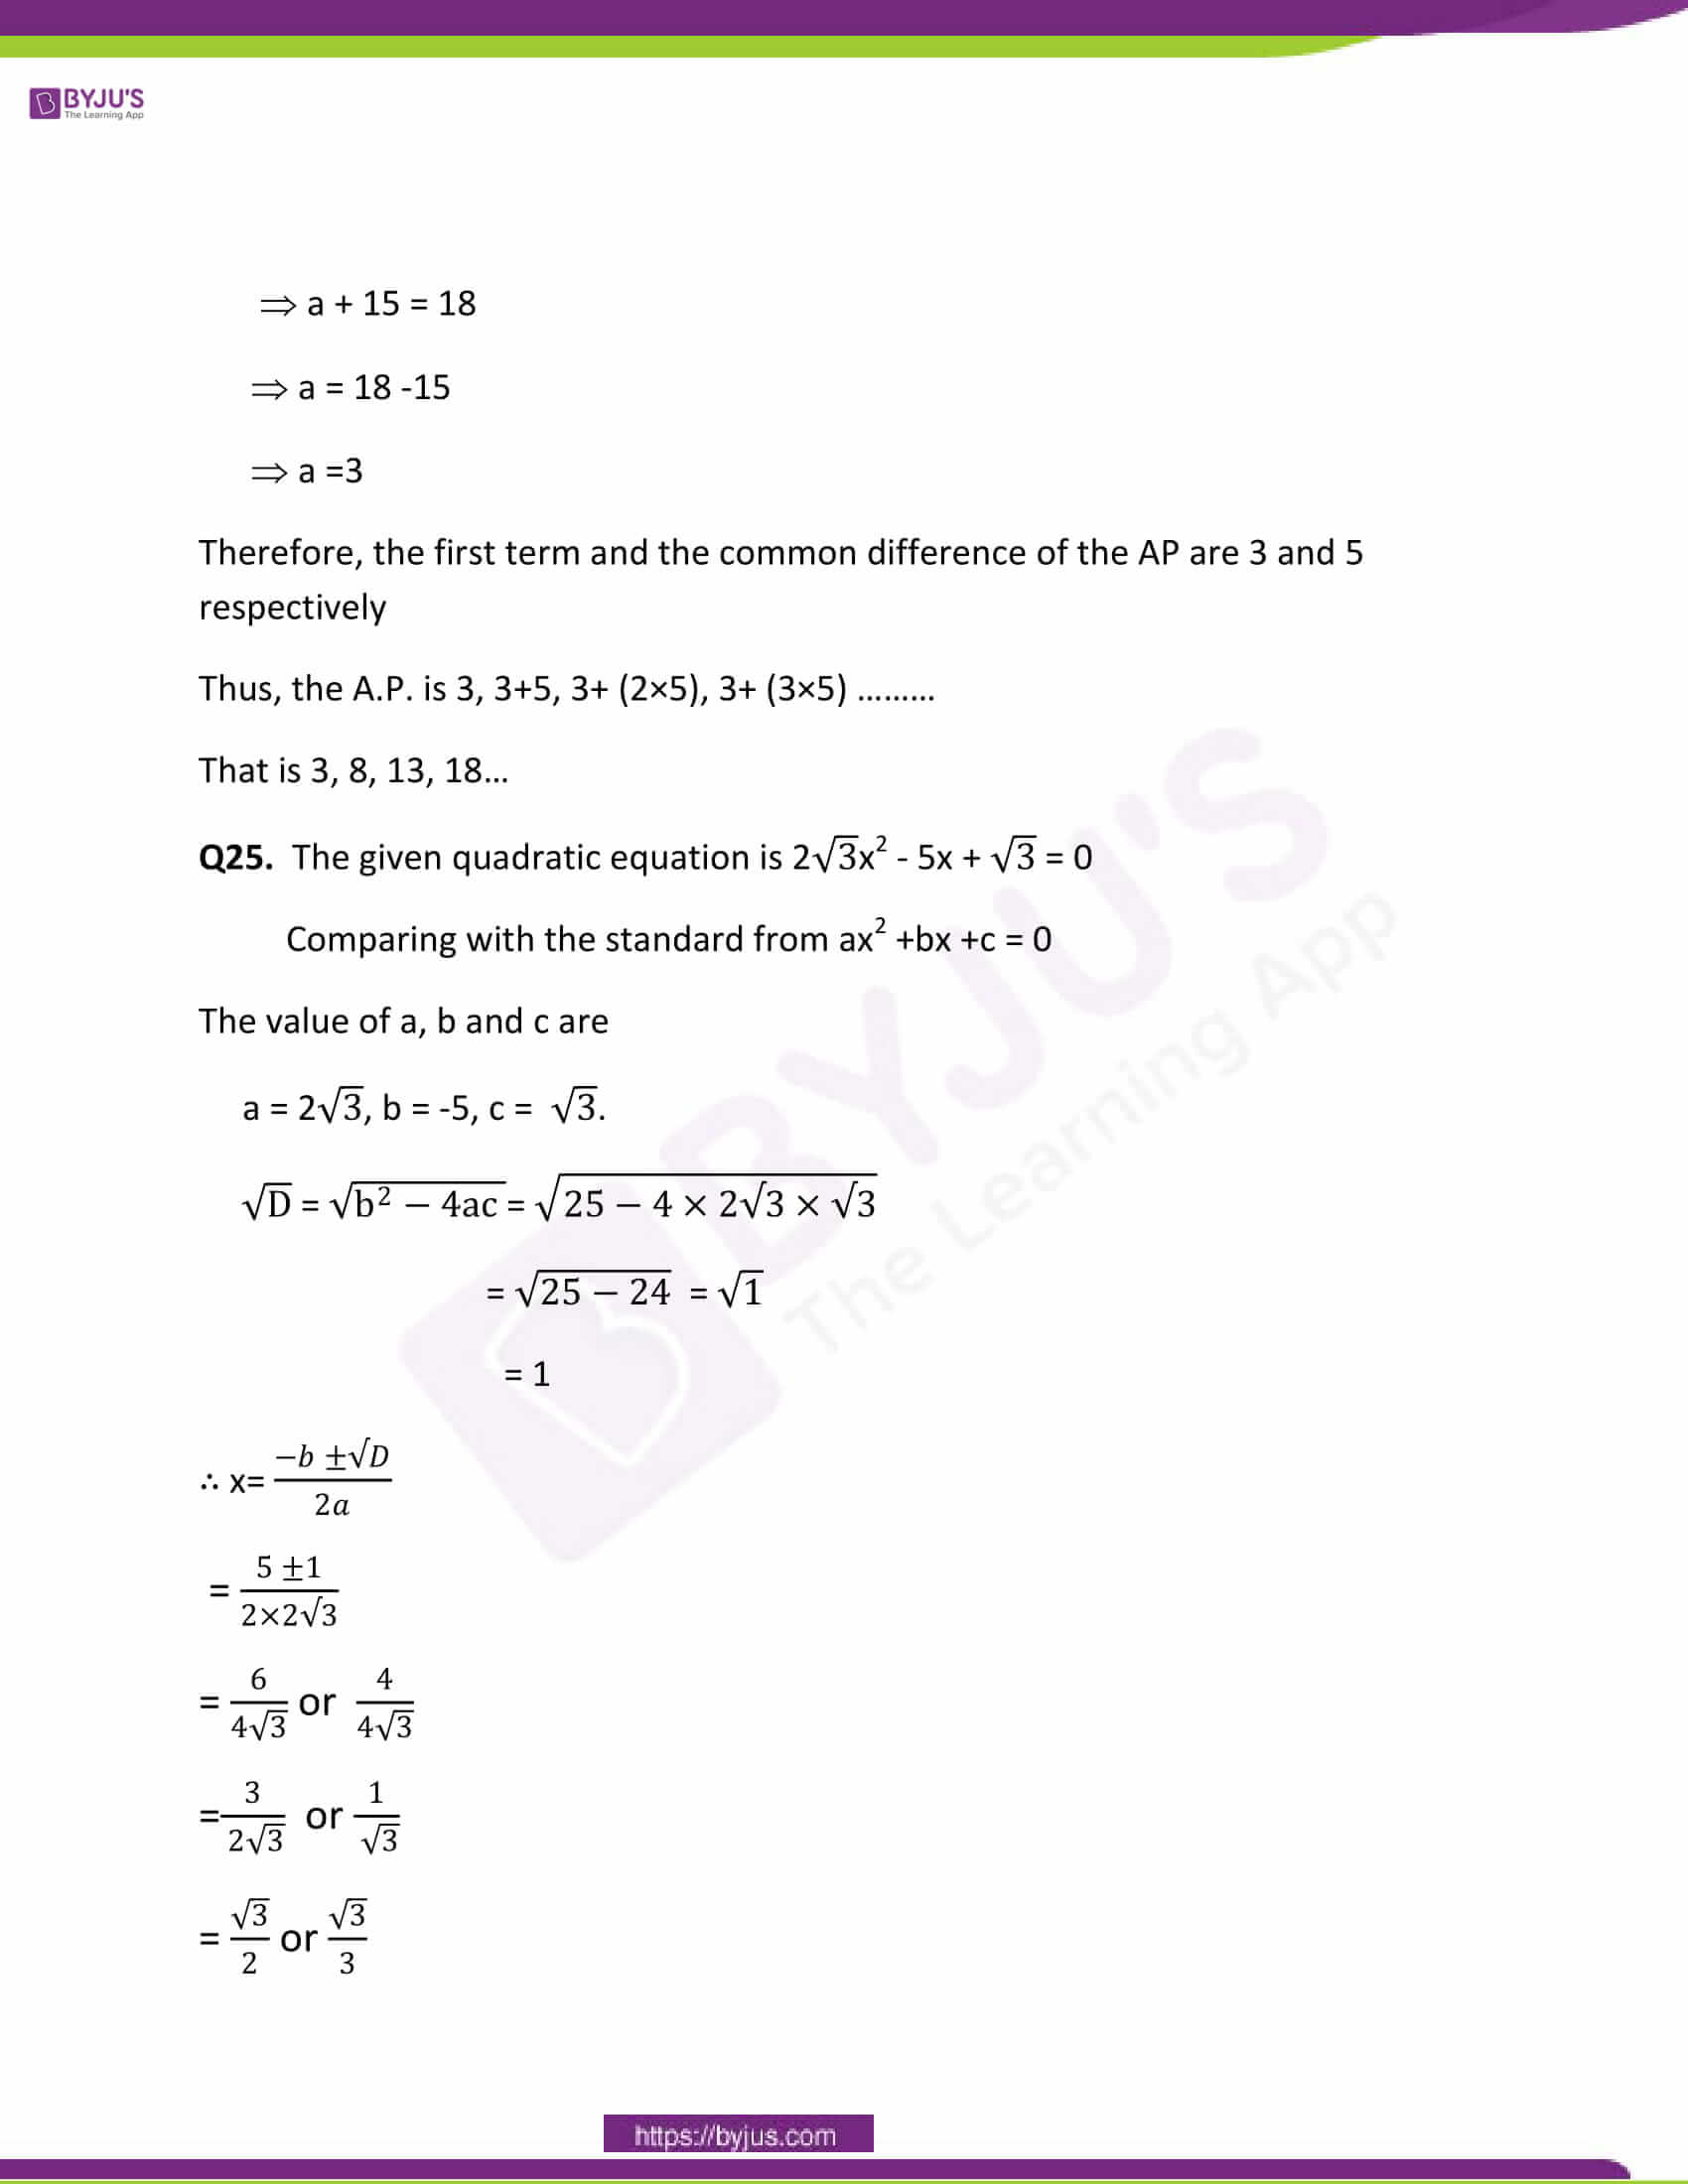 CBSE Class 10 Maths Papers Solution 2011 19